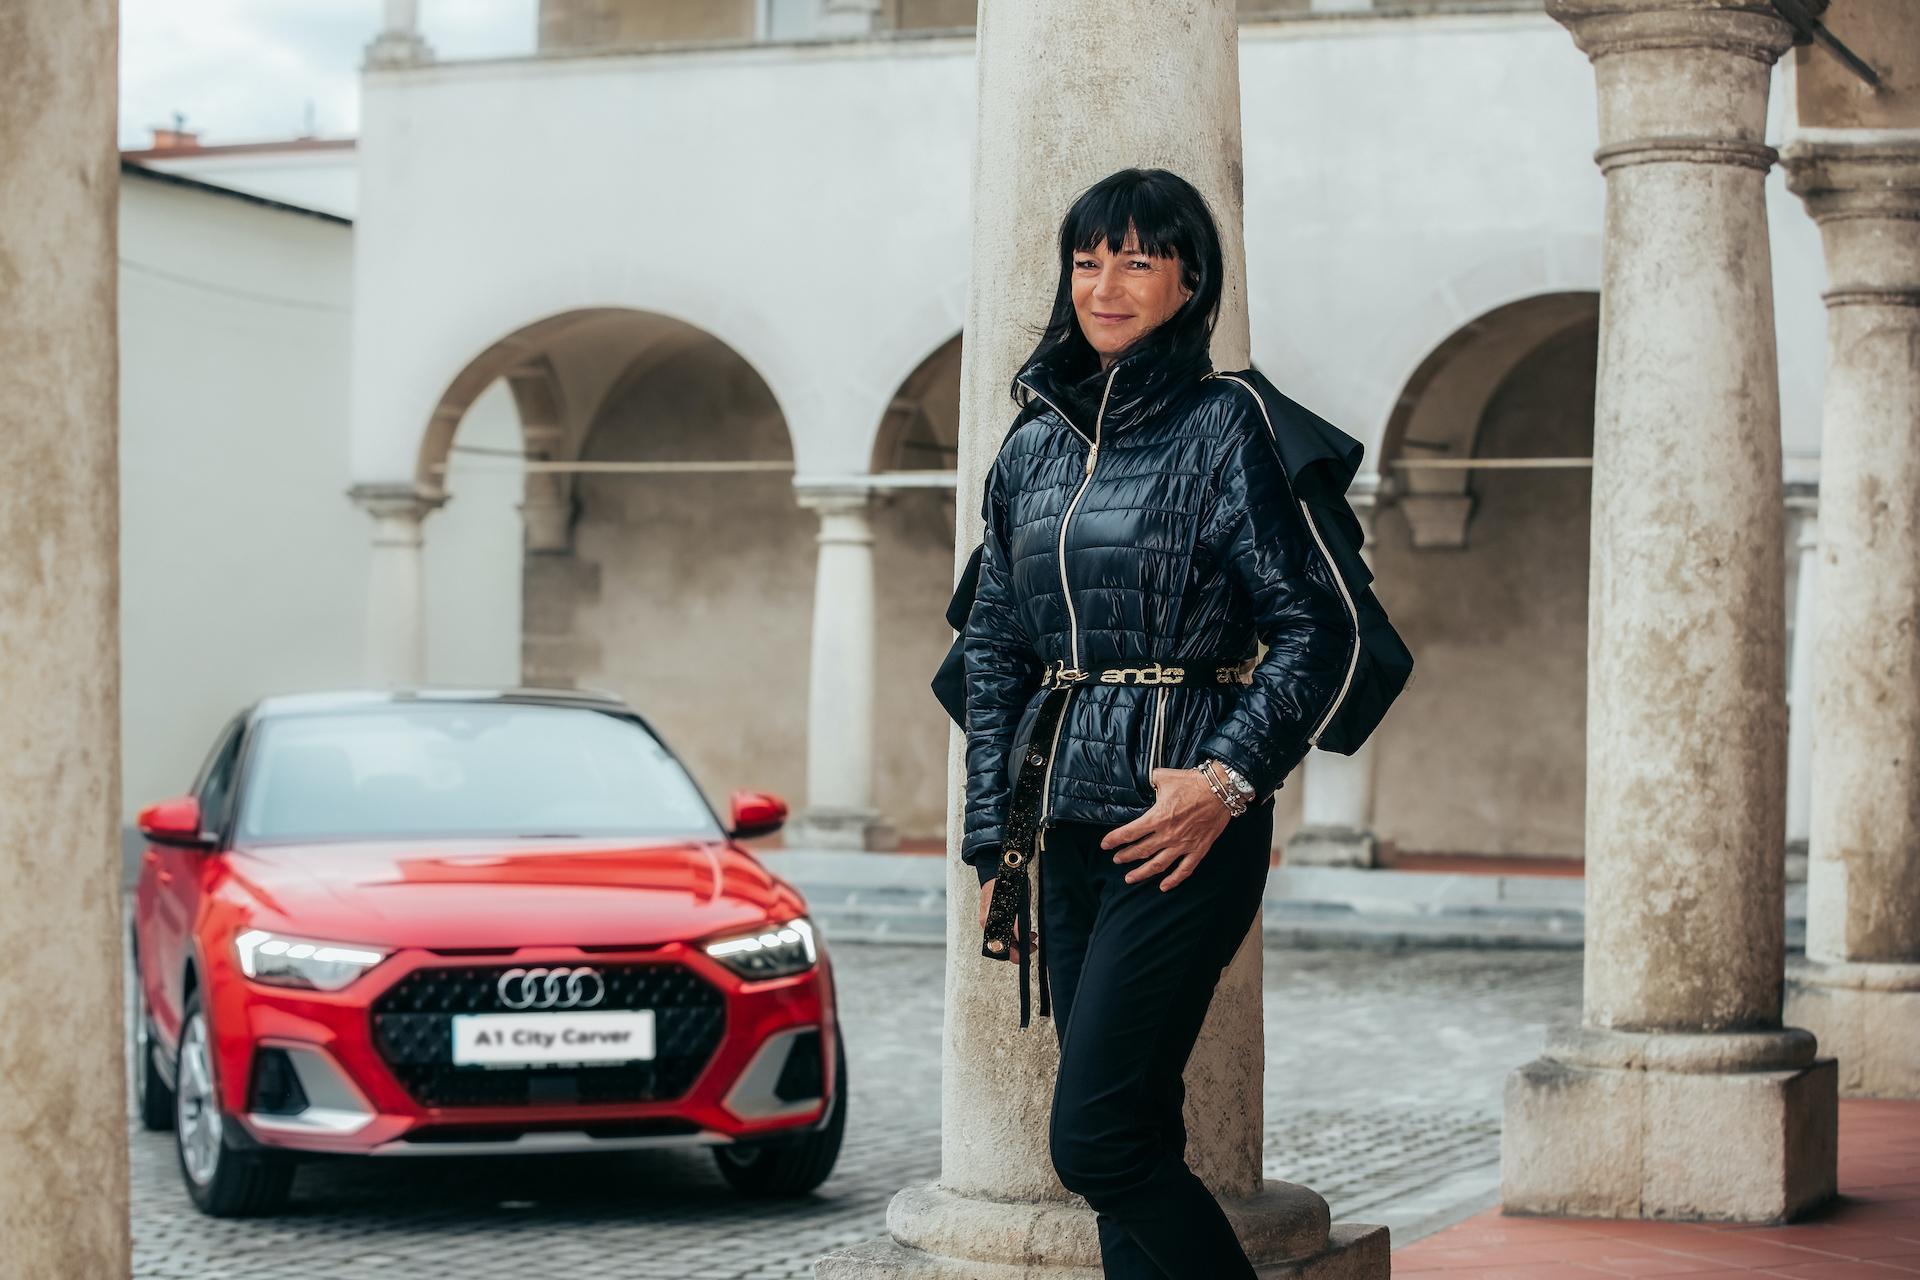 Nataša Berginc, v ozadju Audi A1 citycarver